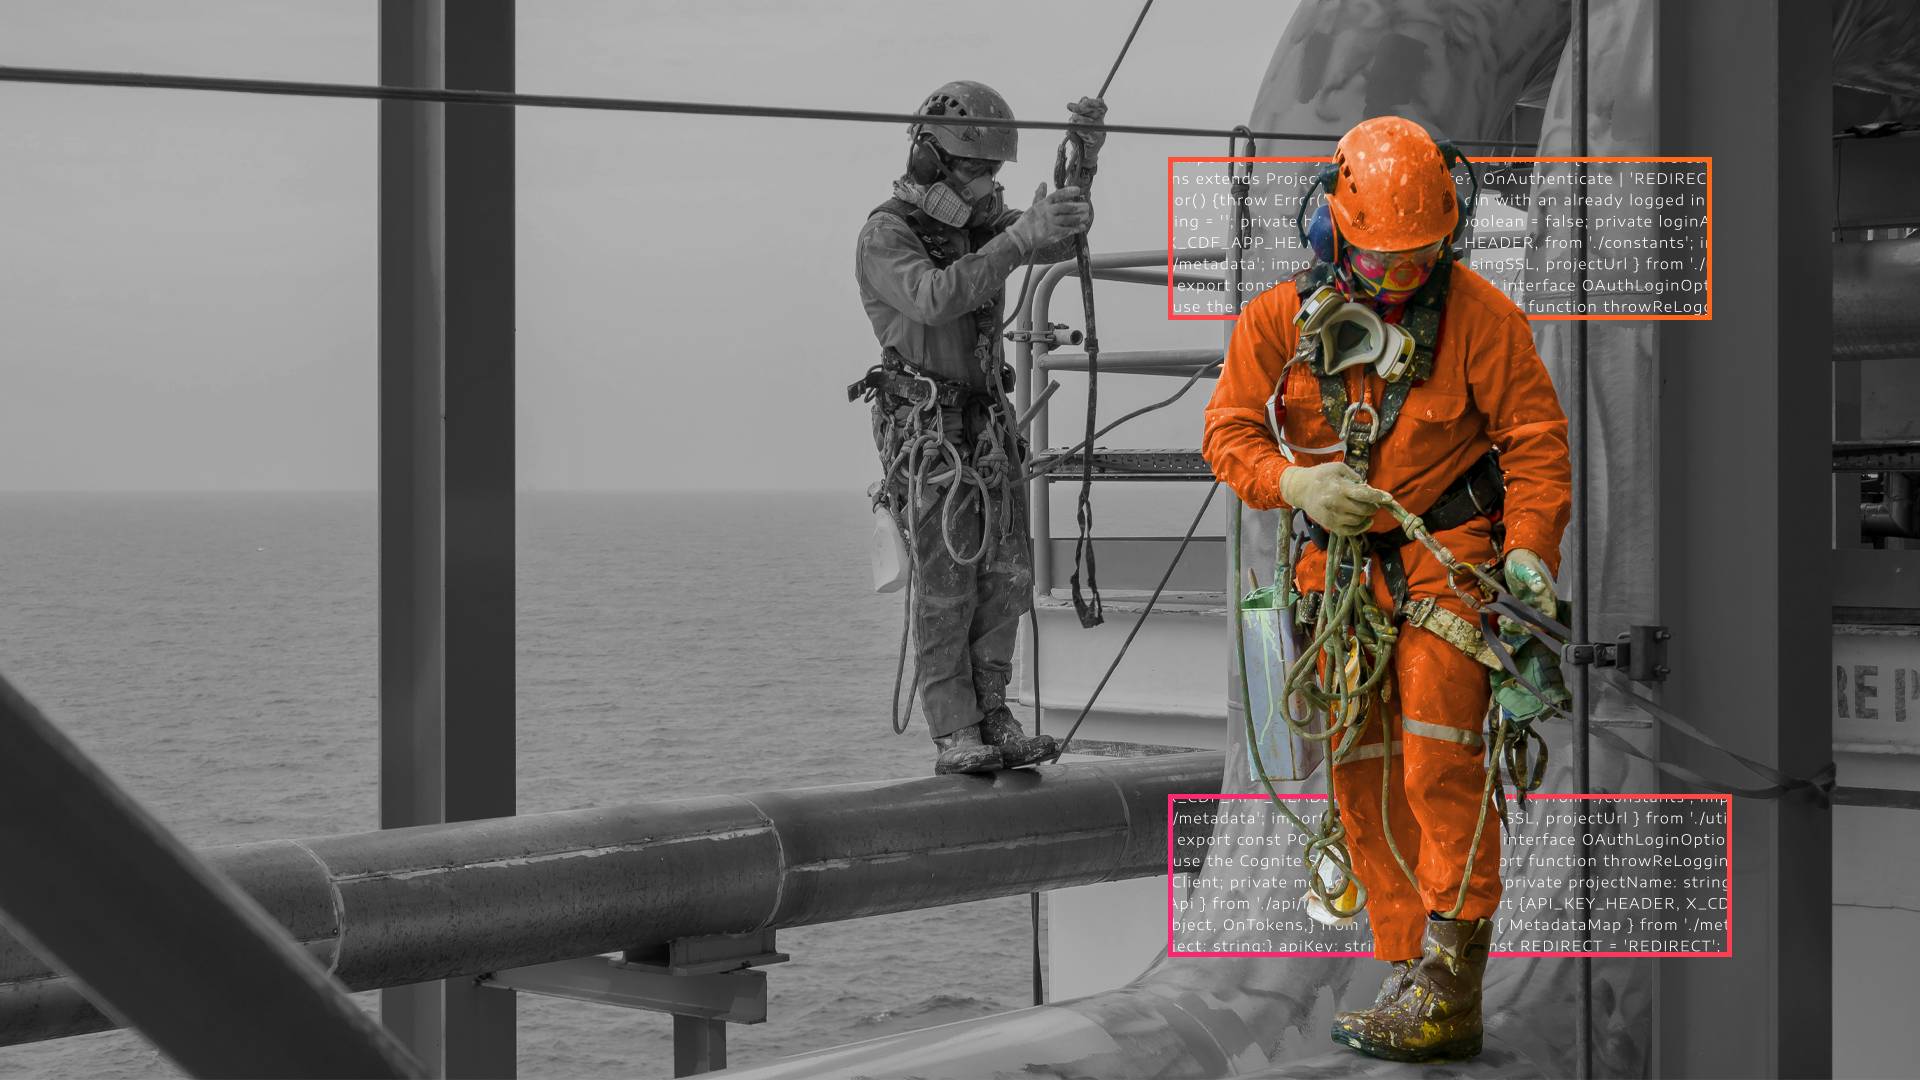 MDDM offshore worker 2